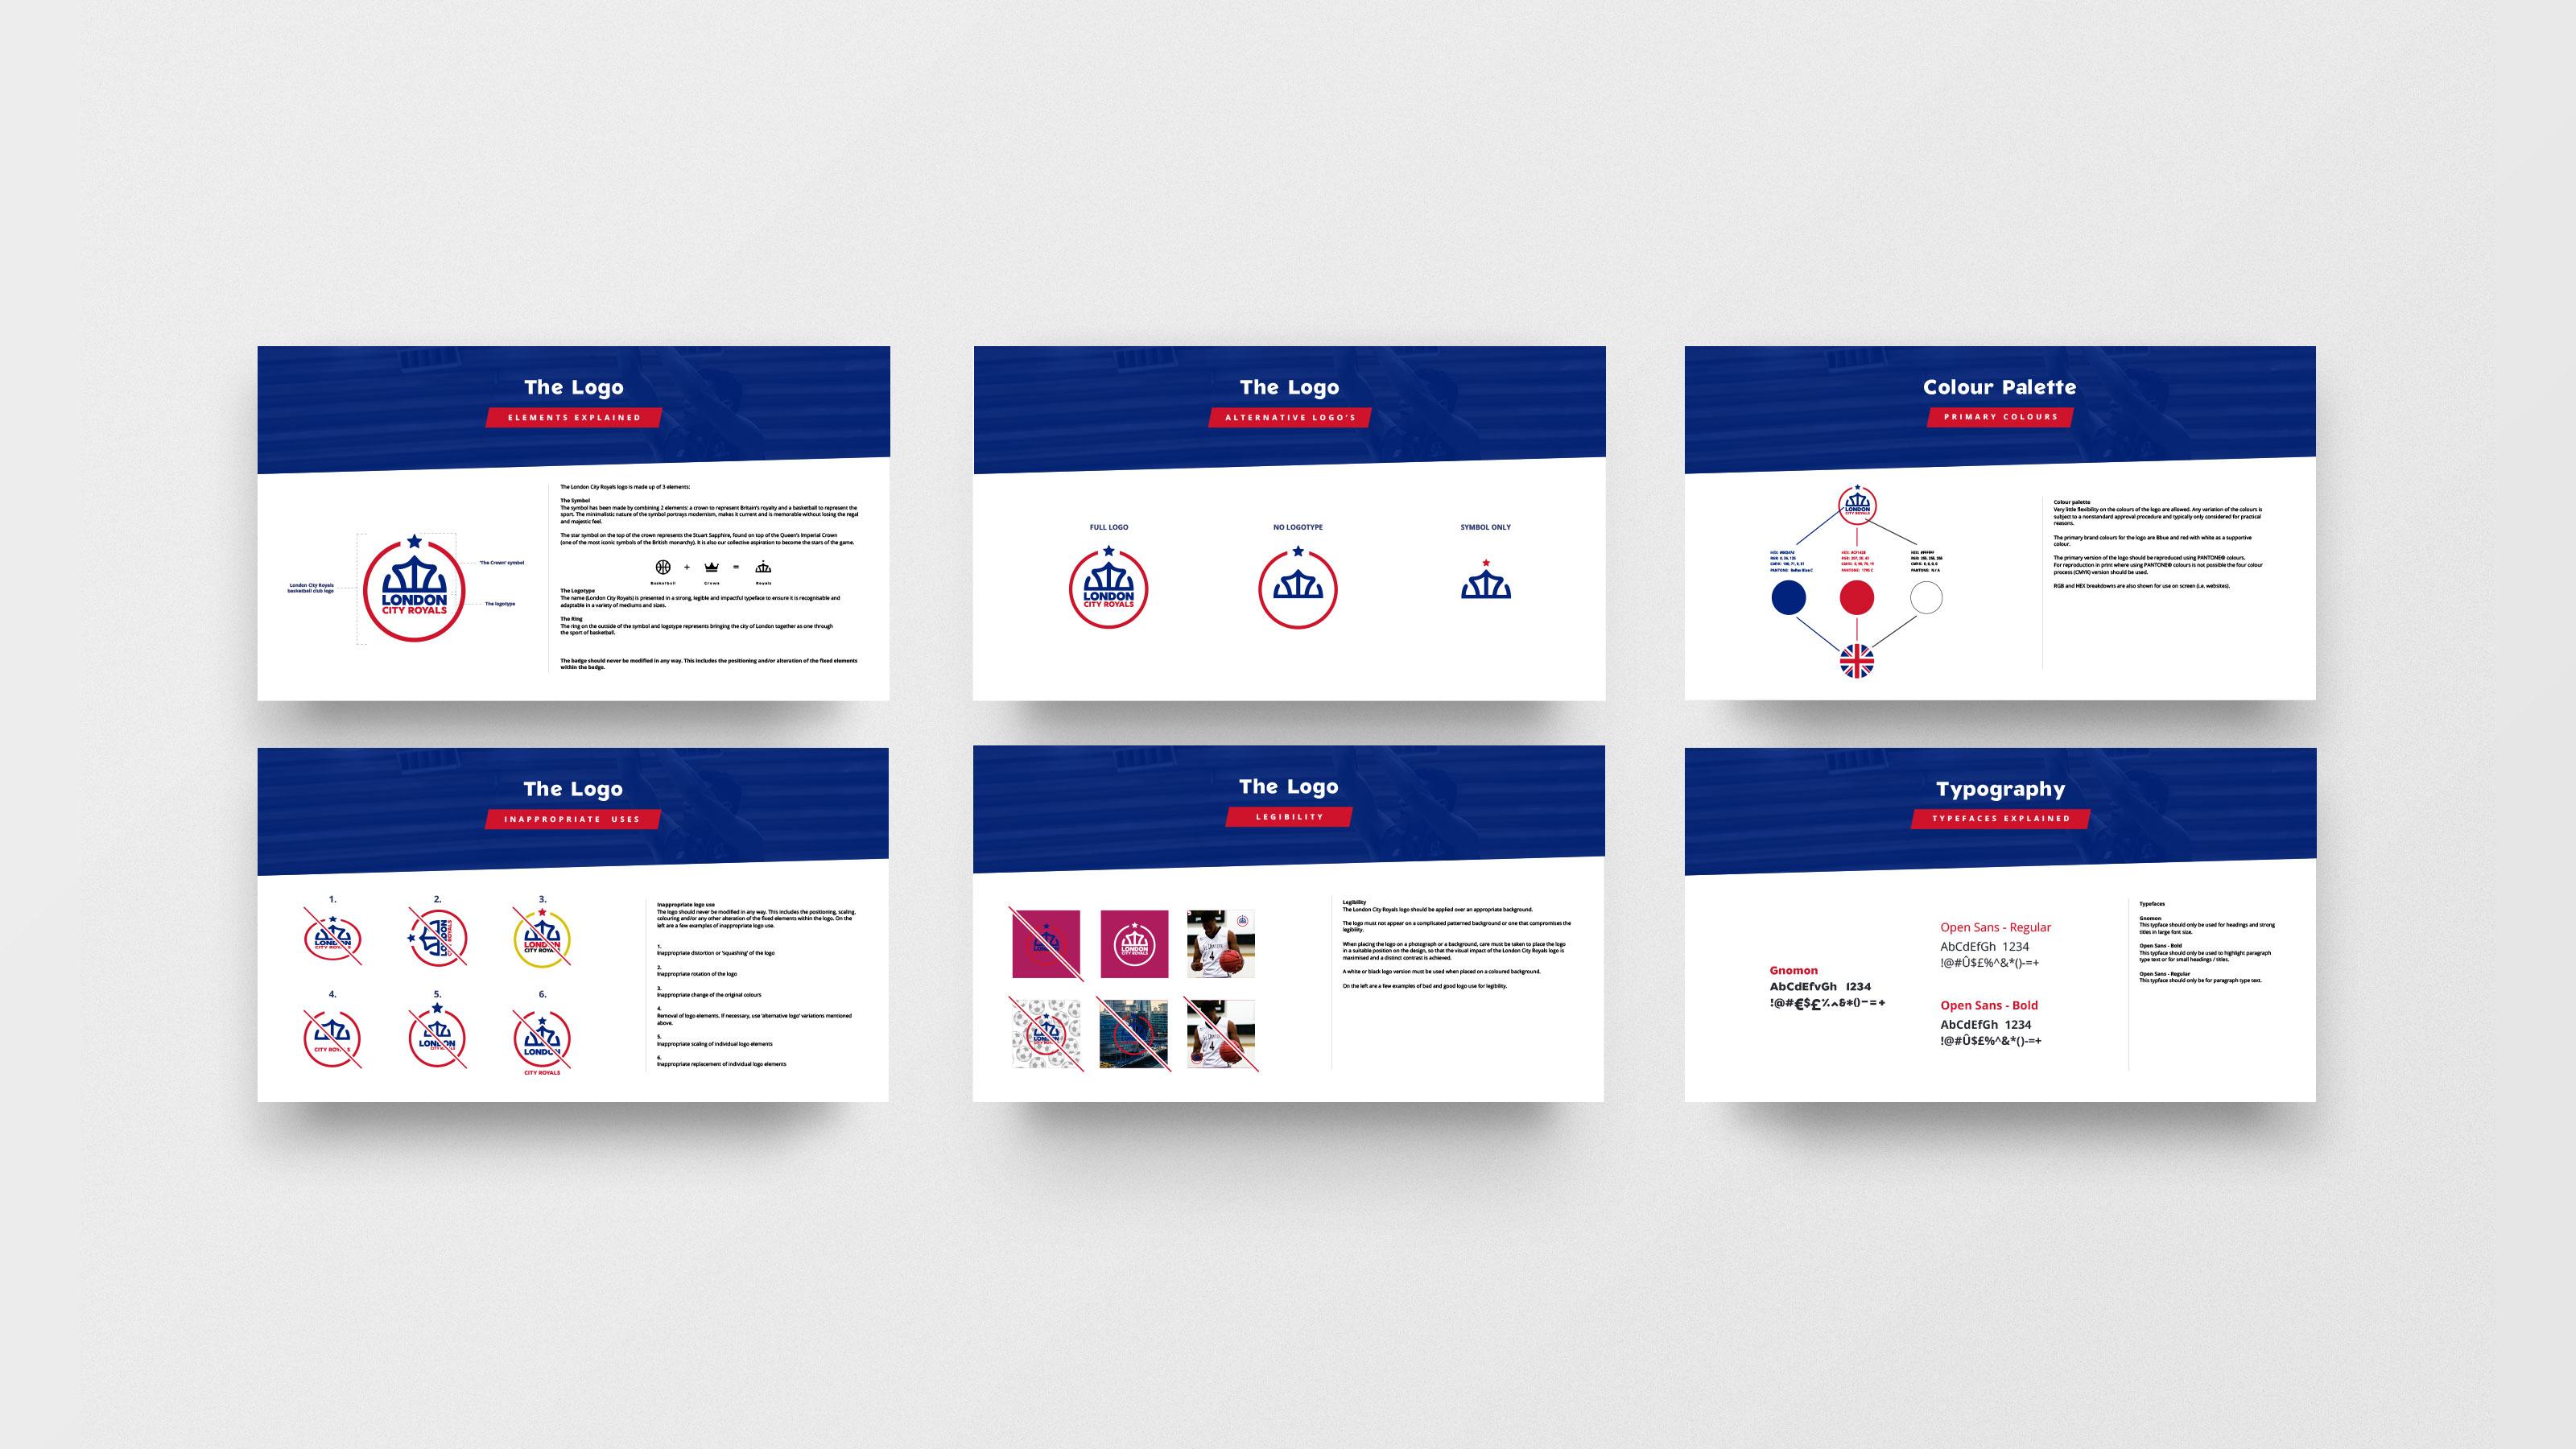 london-city-royals-basketball-branding-brand-guidelines-by-orfi-media